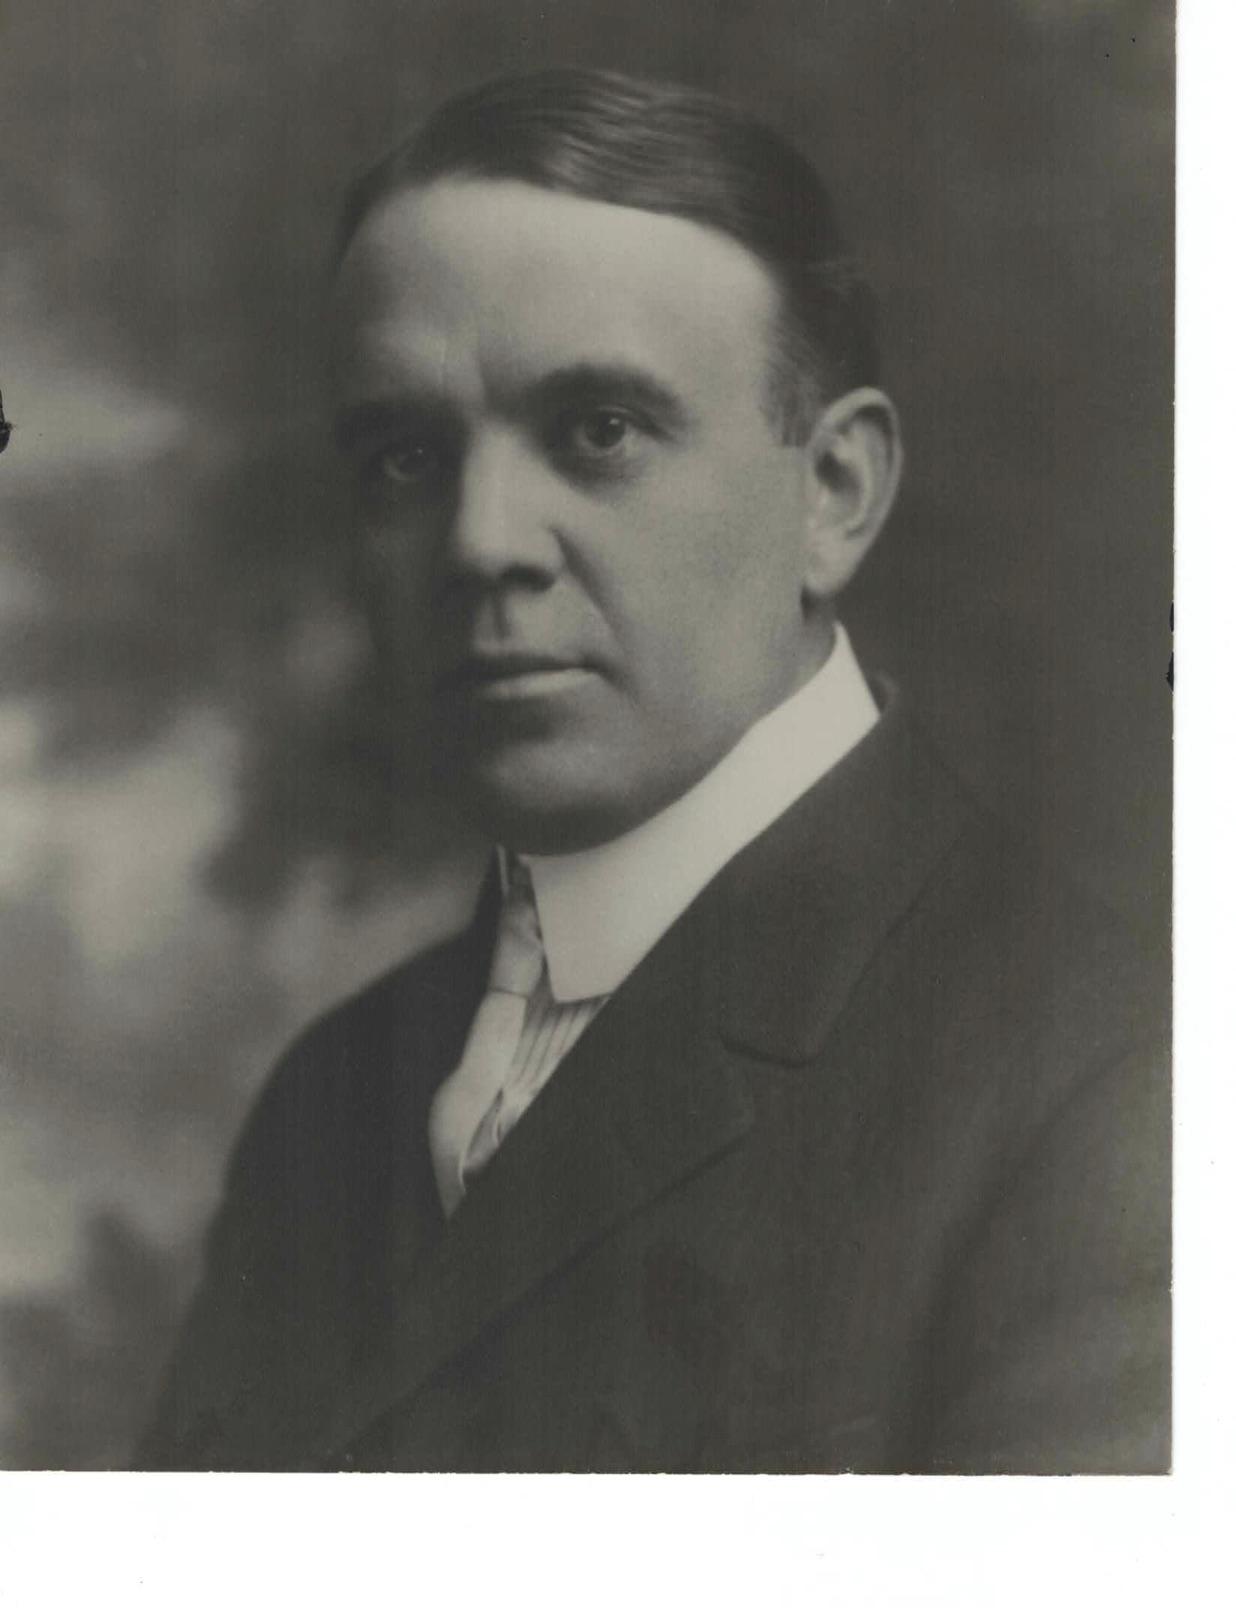 RAYMOND R FRAZIER 1915-16